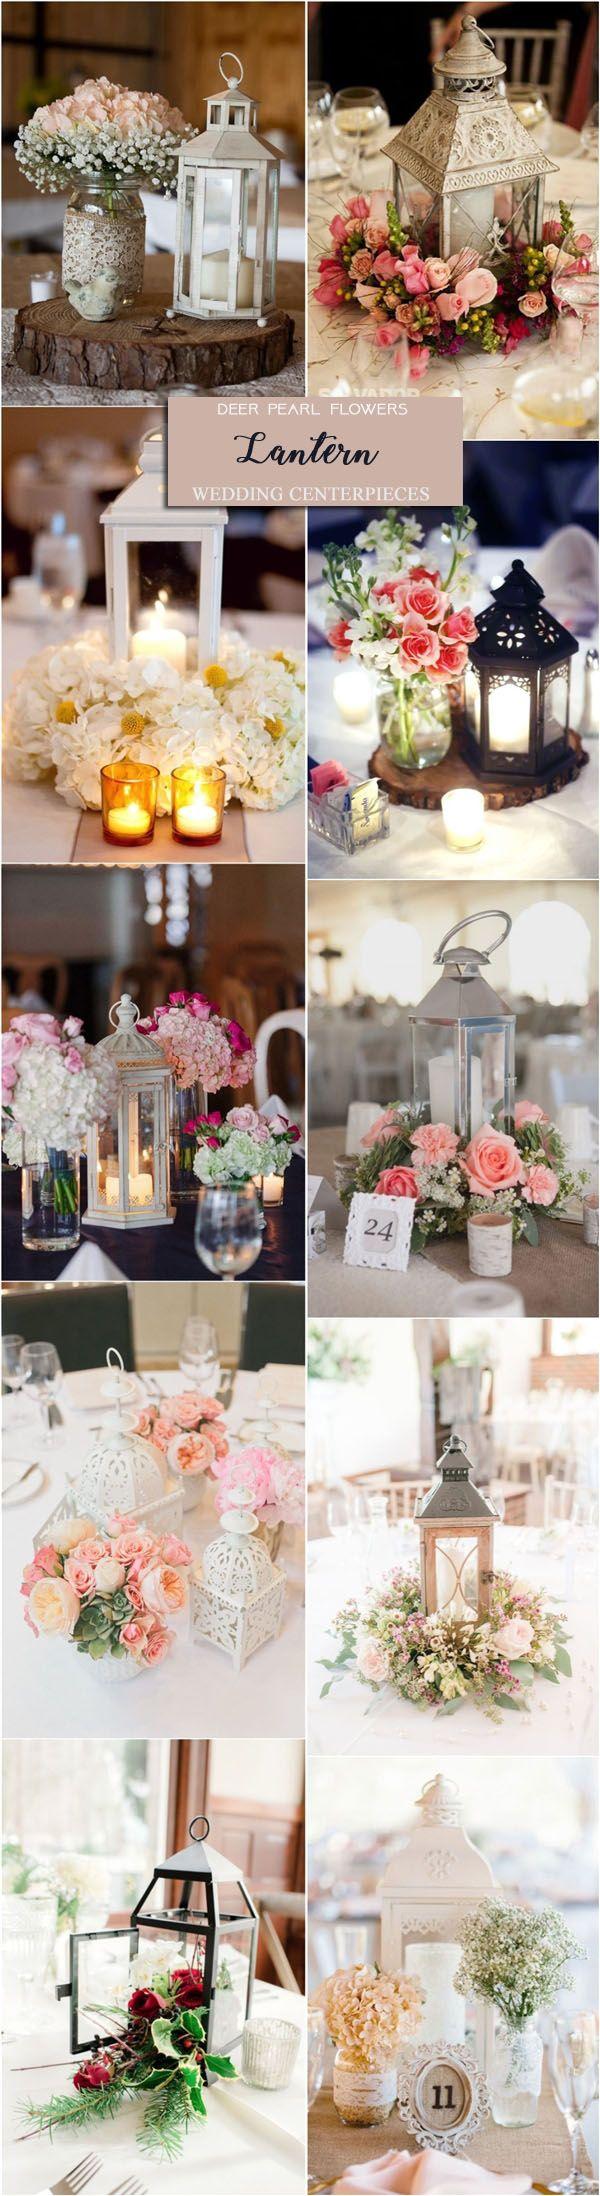 Vintage wedding scrapbook ideas - 60 Insanely Wedding Centerpiece Ideas You Ll Love